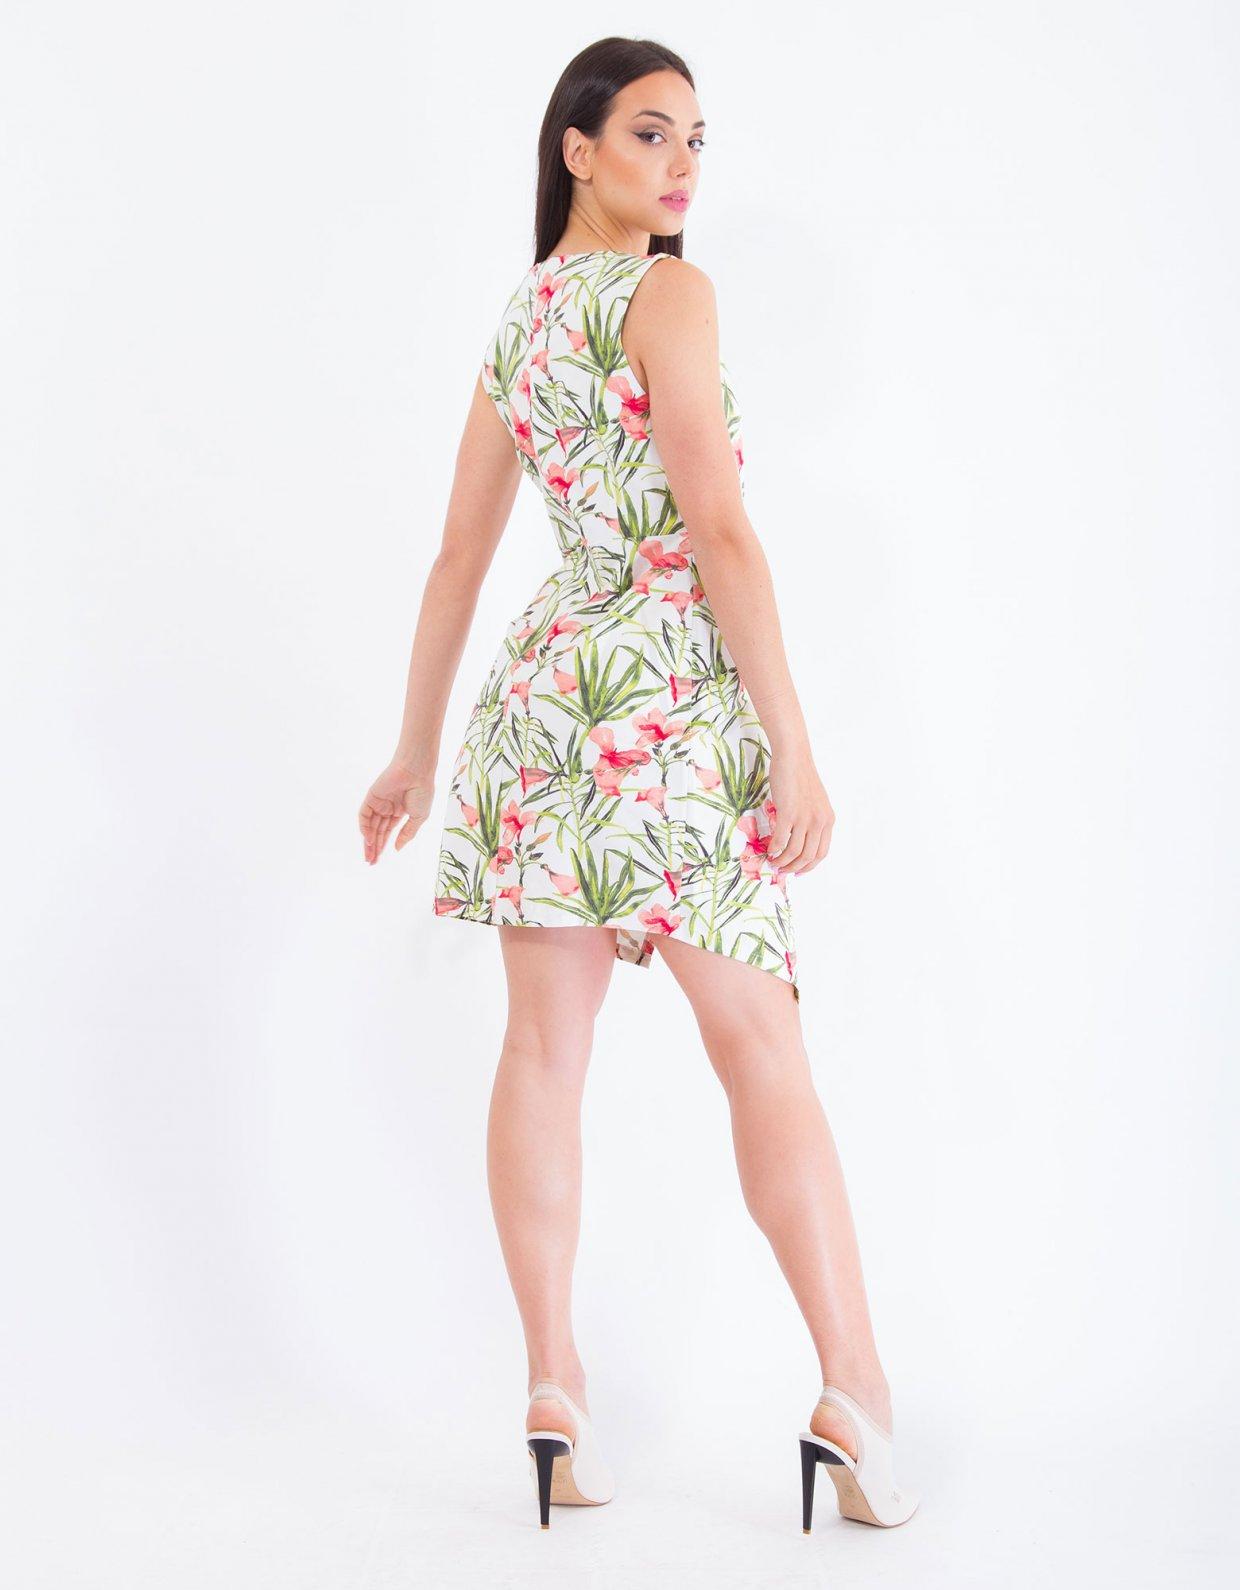 ANGELEYE Tyra dress